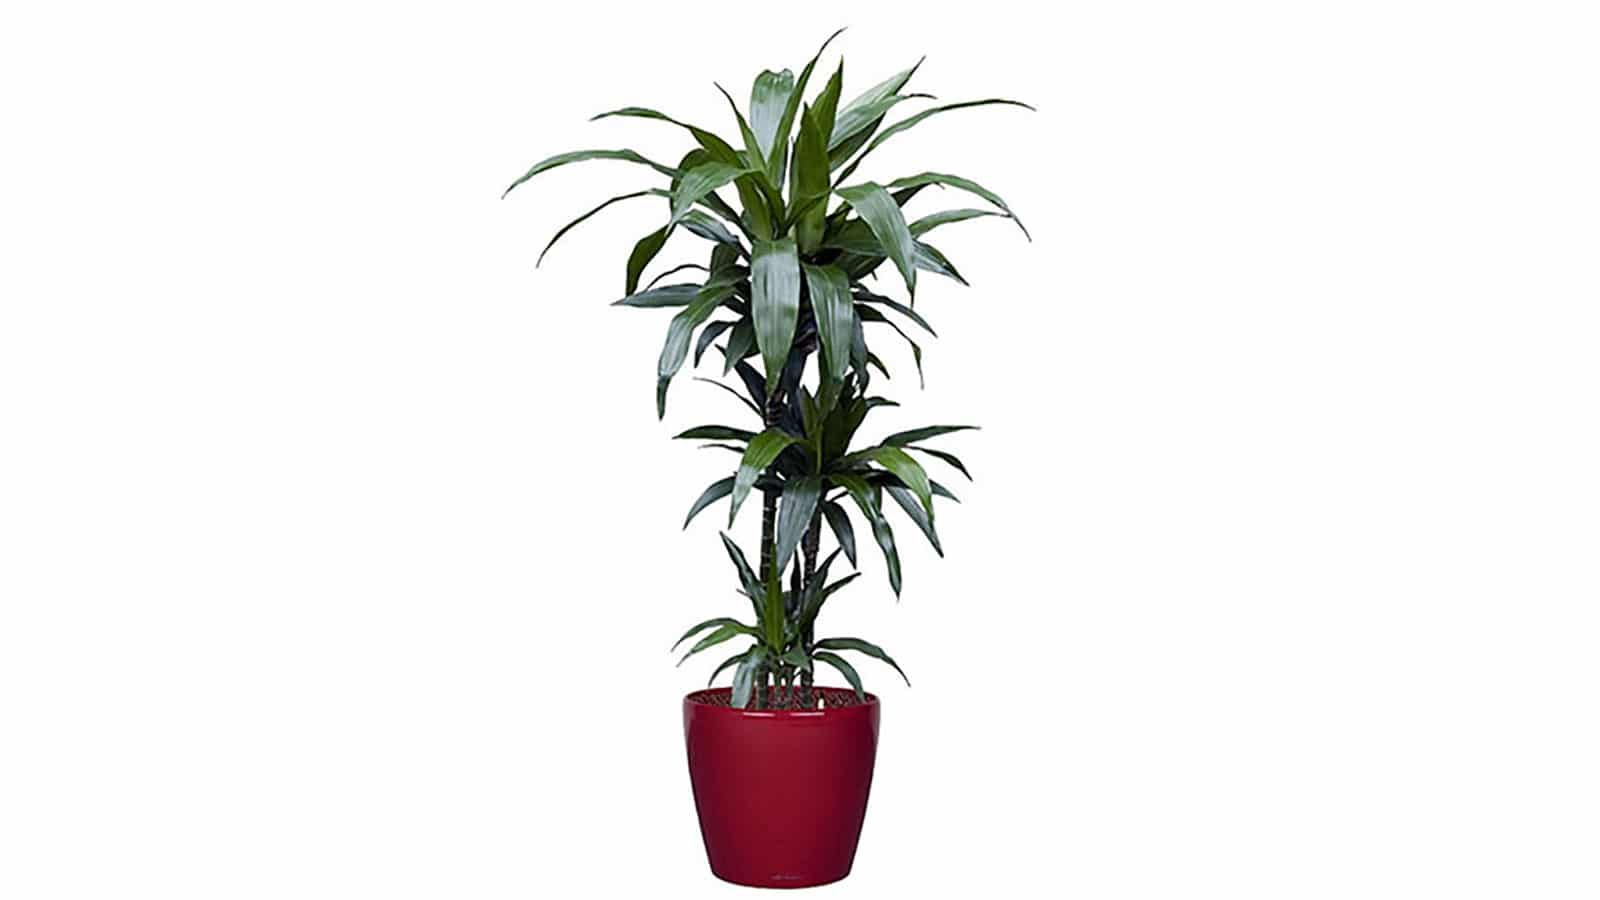 Драцена (Dracaena Deremensis). Как да пречистим въздуха у дома